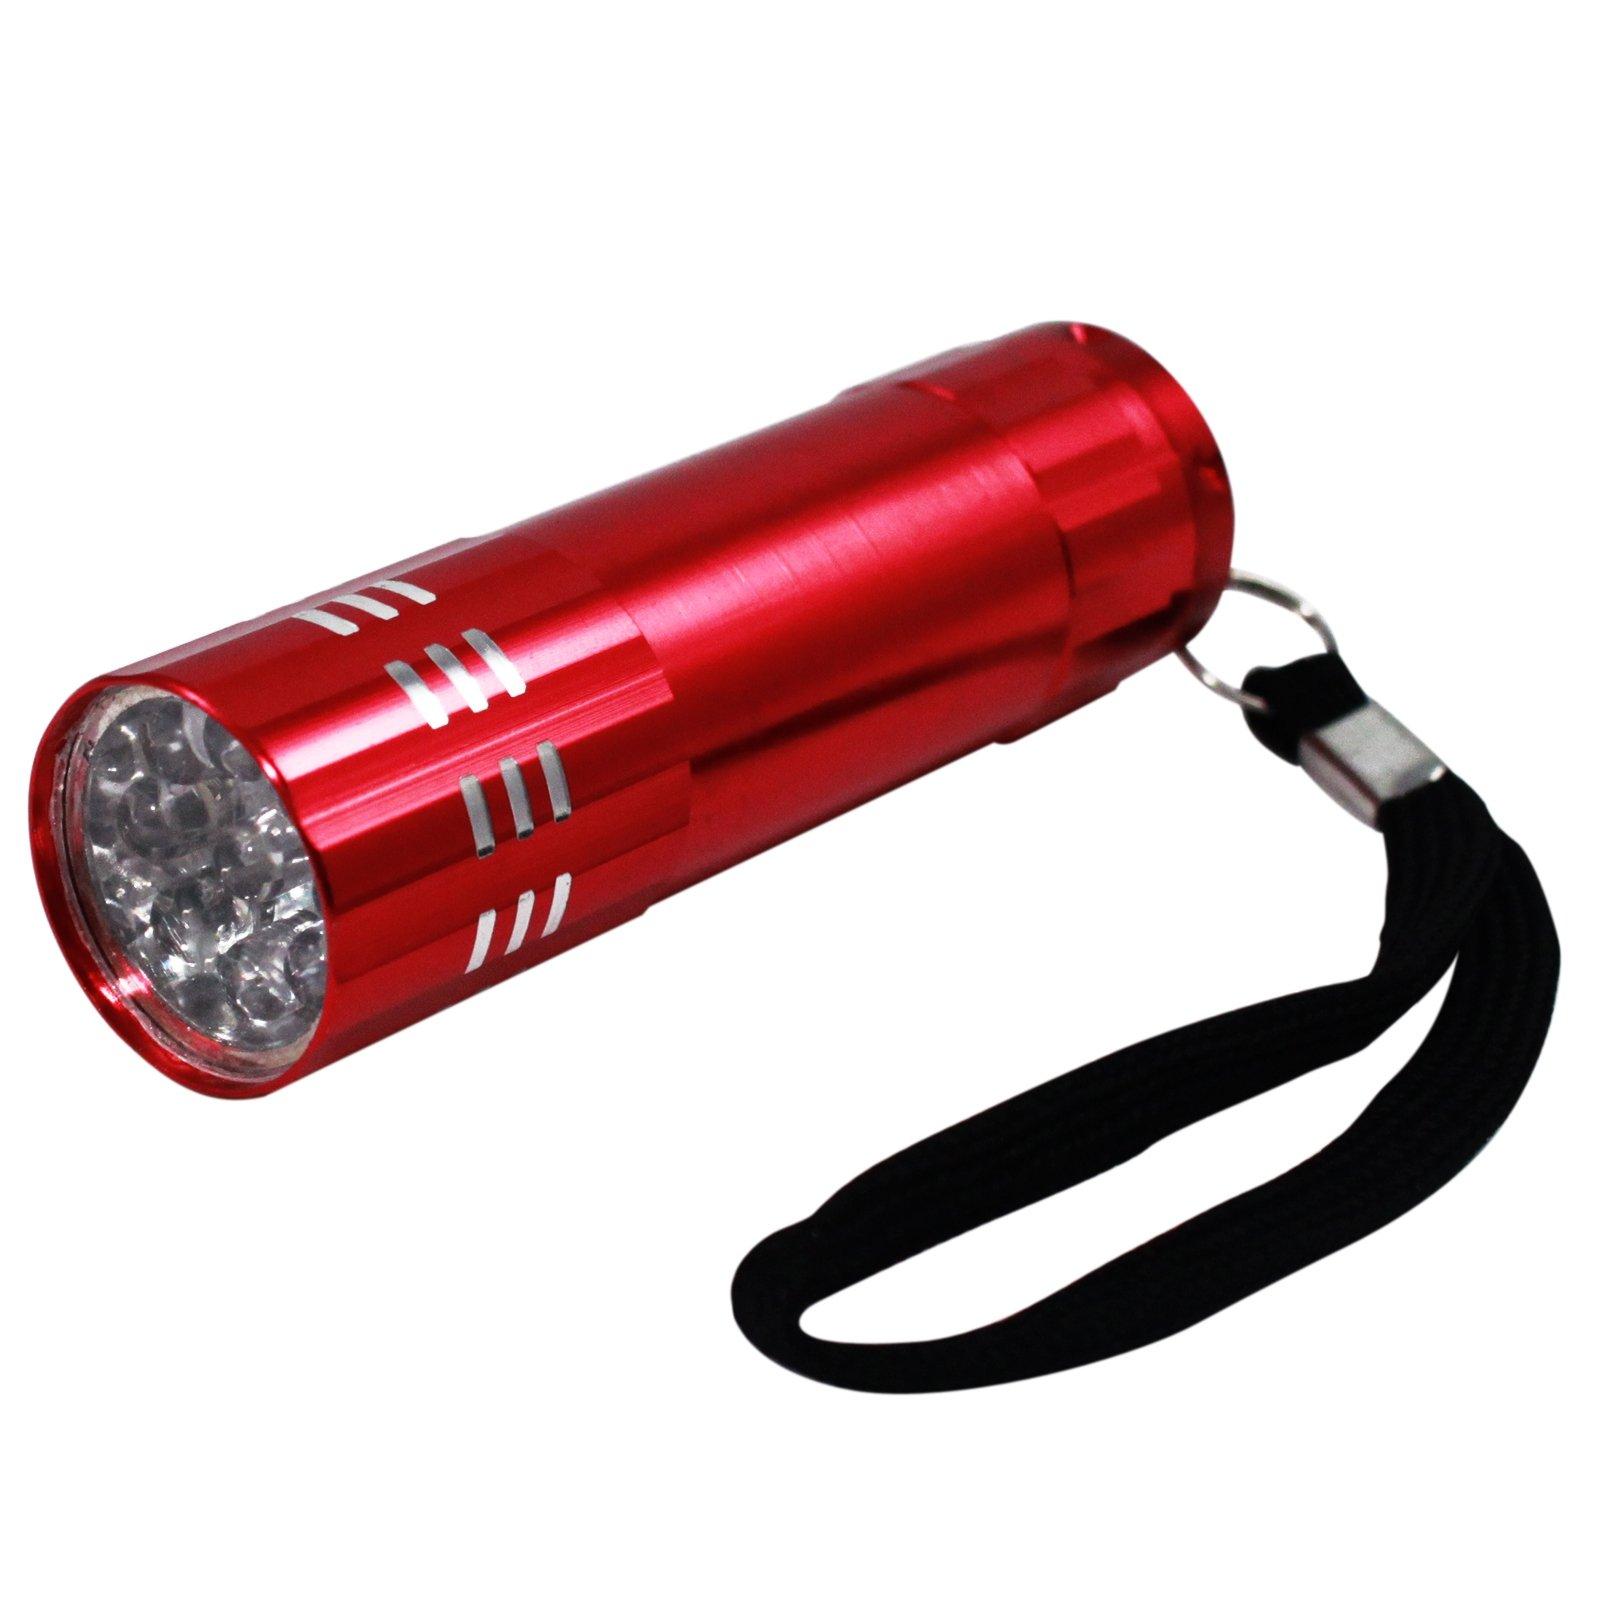 9 LED Super Bright Portable Red Mini Flashlight with Lanyard